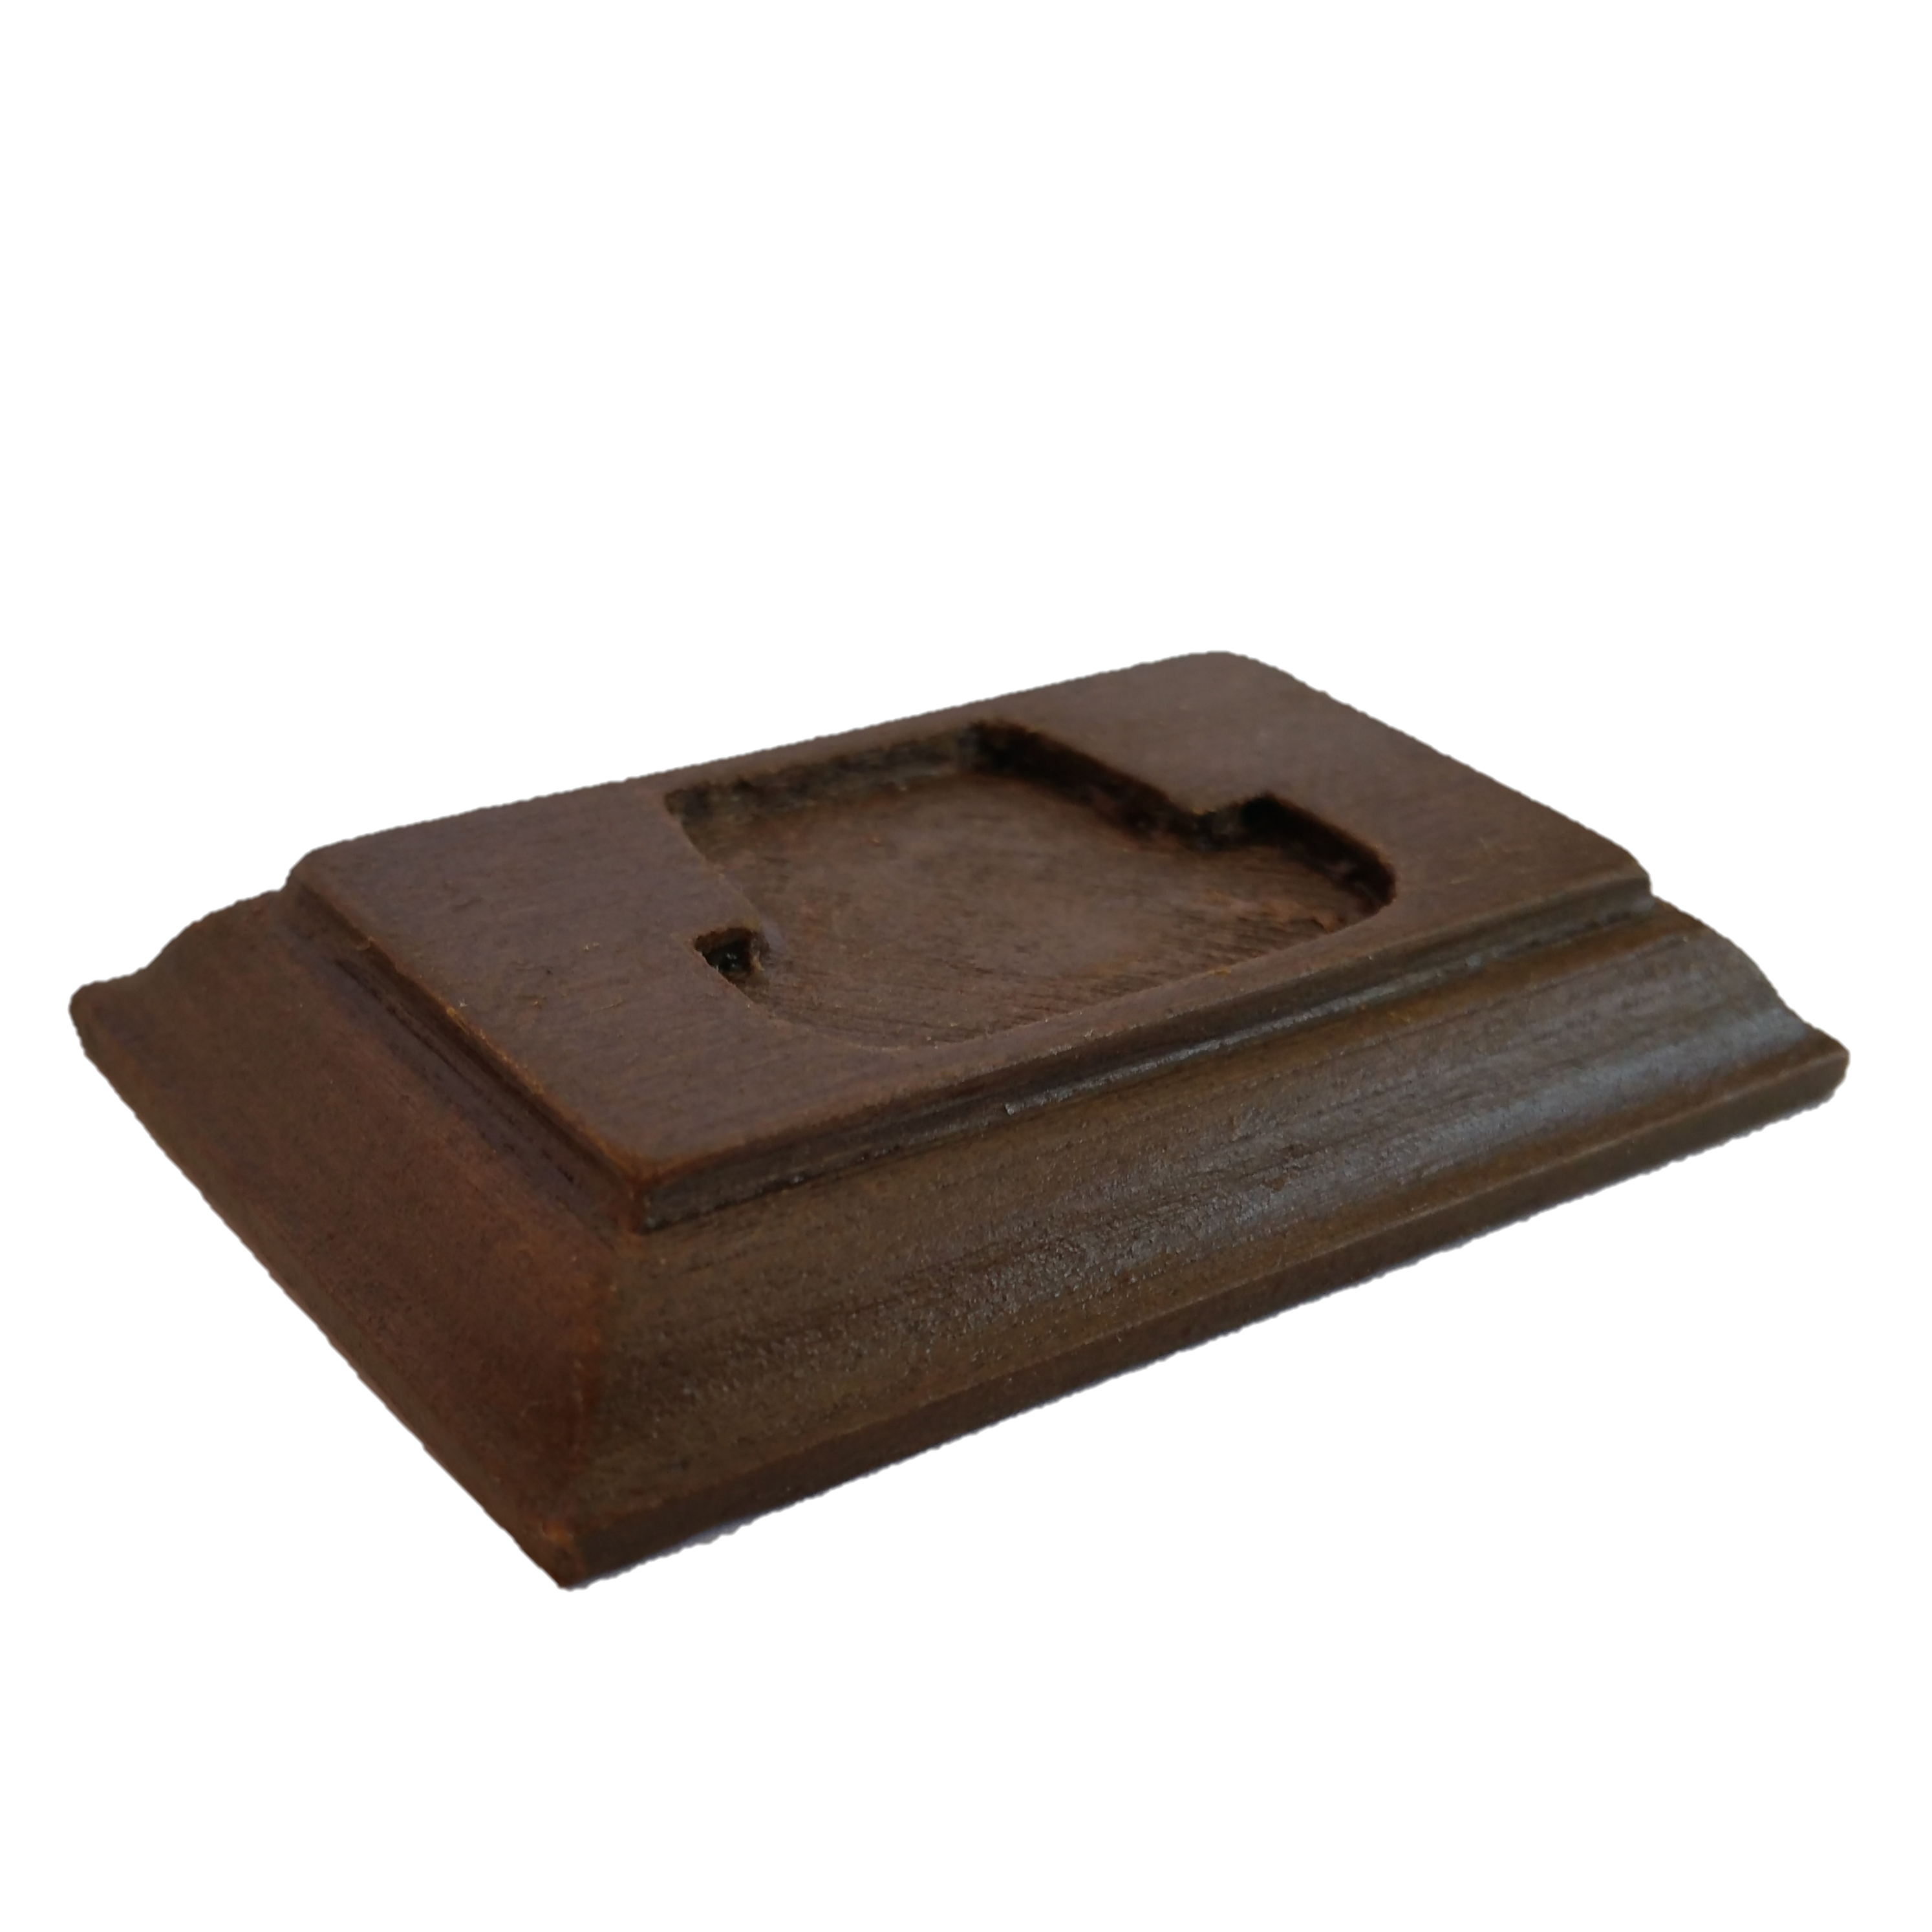 Socle en bois marron foncé 006.png Download STL file COIN DISPLAY • 3D printable model, Helios-Maker